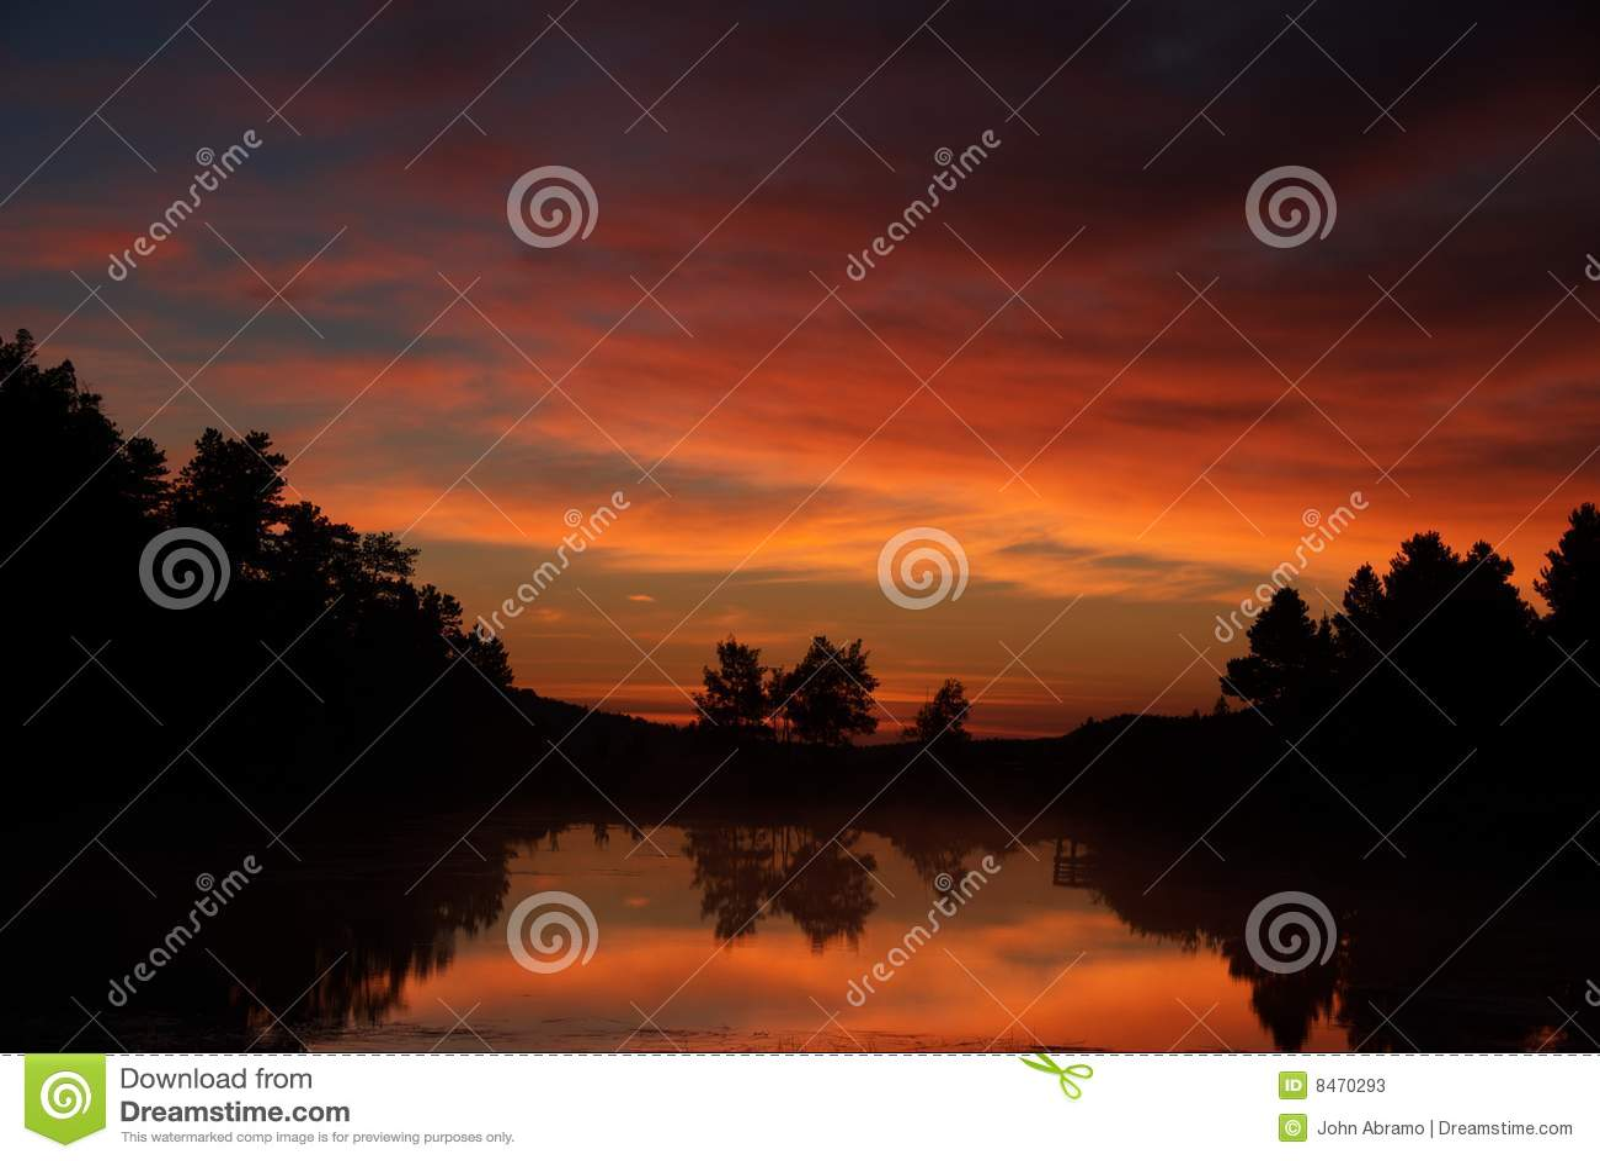 Lake över scenisk solnedgång